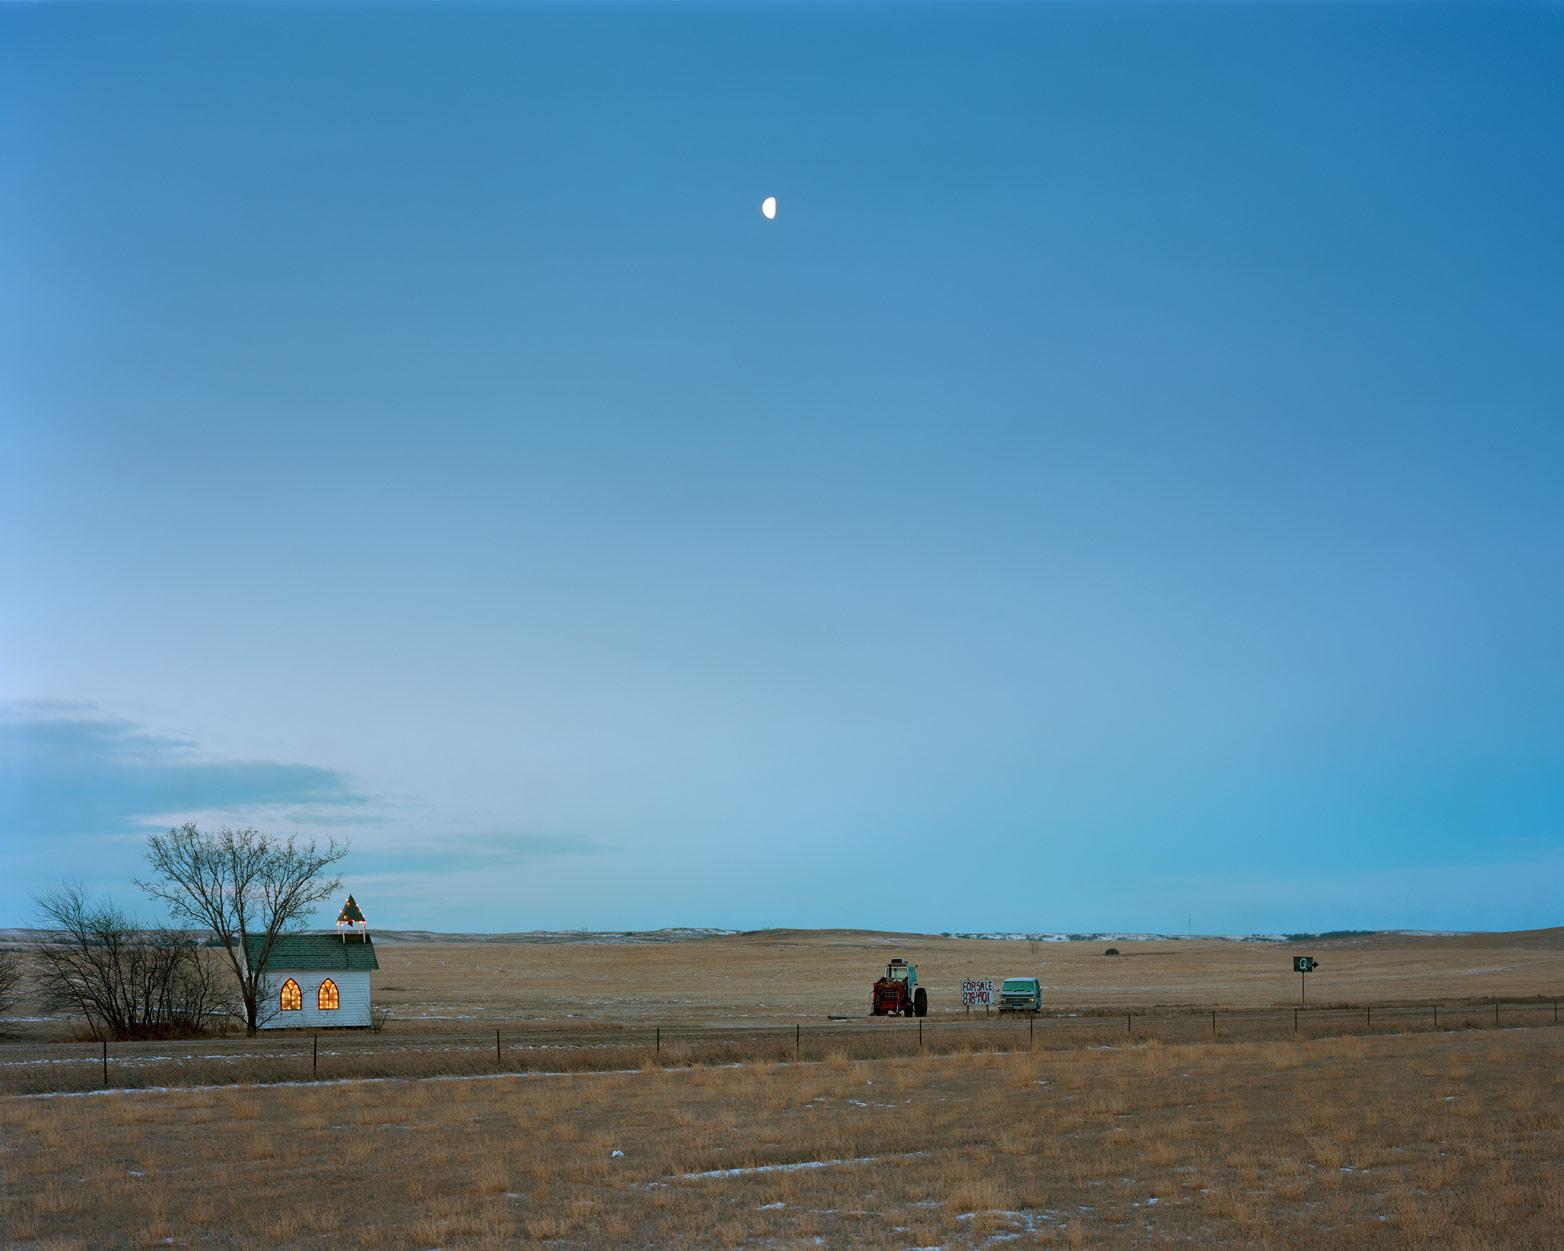 Watertown, South Dakota, 2008